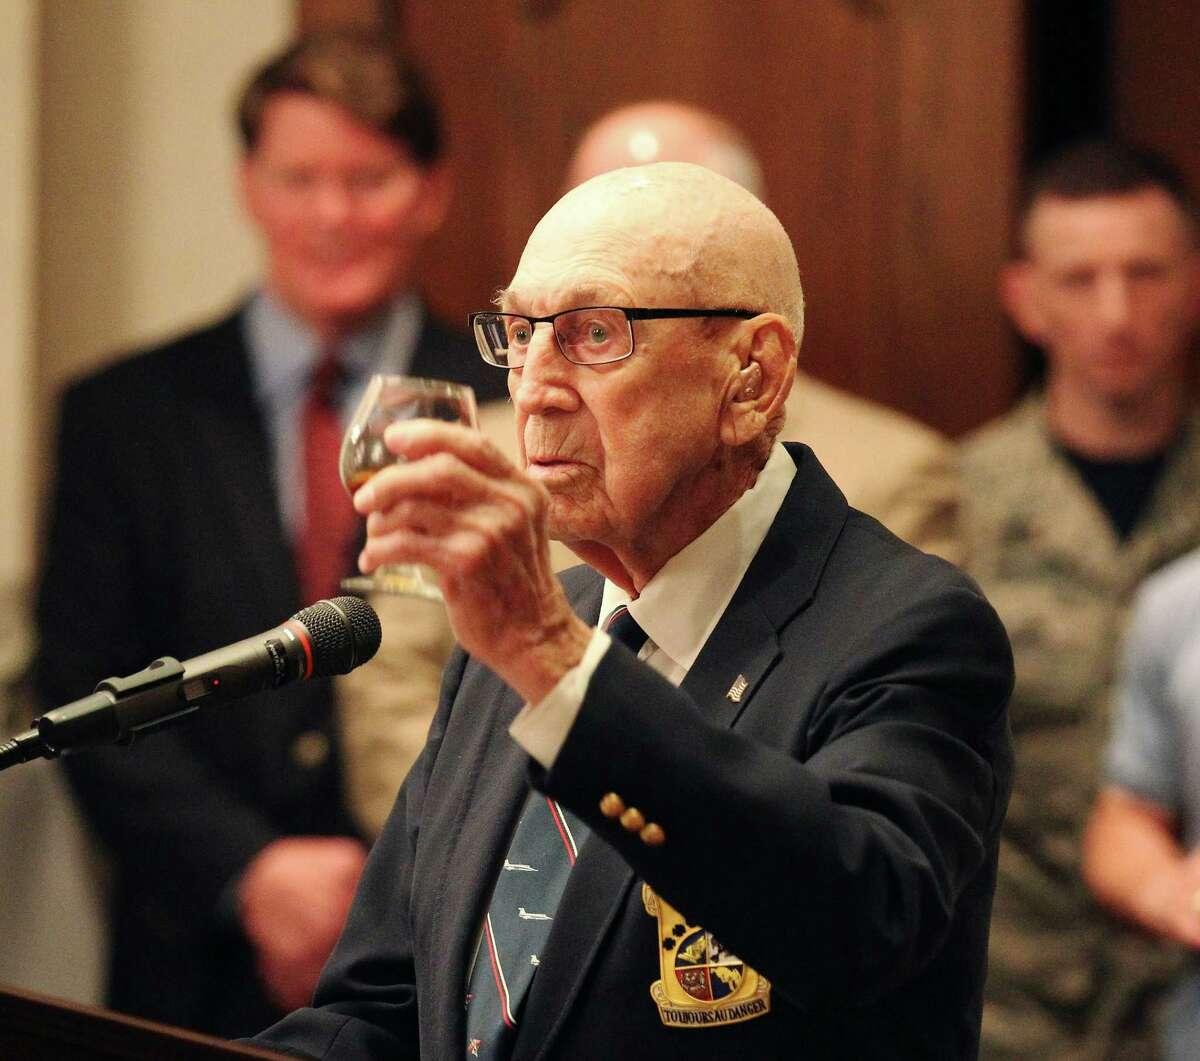 Retired Air Force Lt. Col. Richard